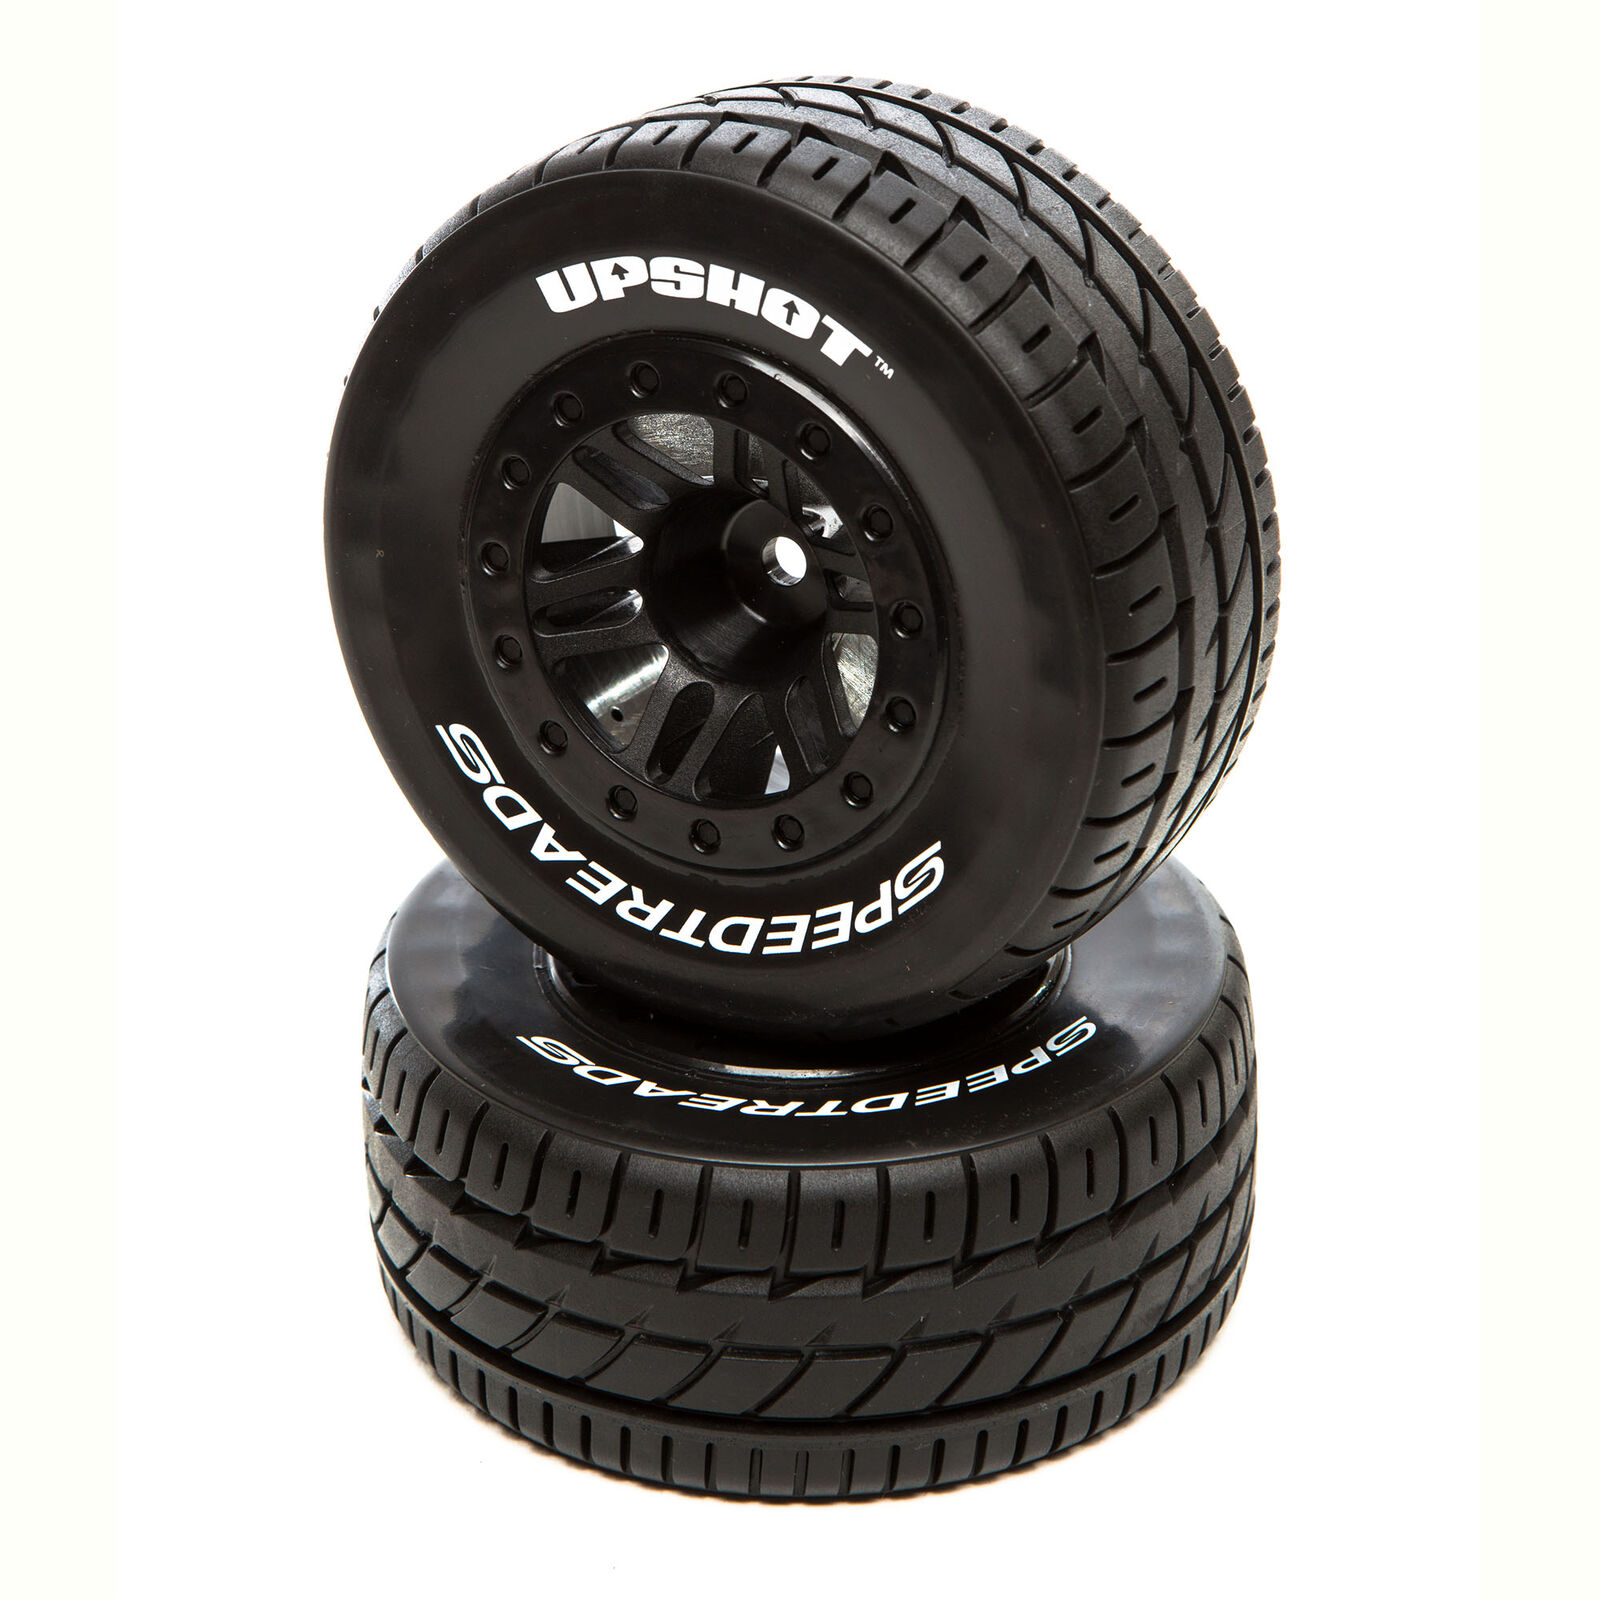 SpeedTreads Upshot SC Tire Front Rear Black Mounted (2): Traxxas Slash/Rustler ECX 4X4